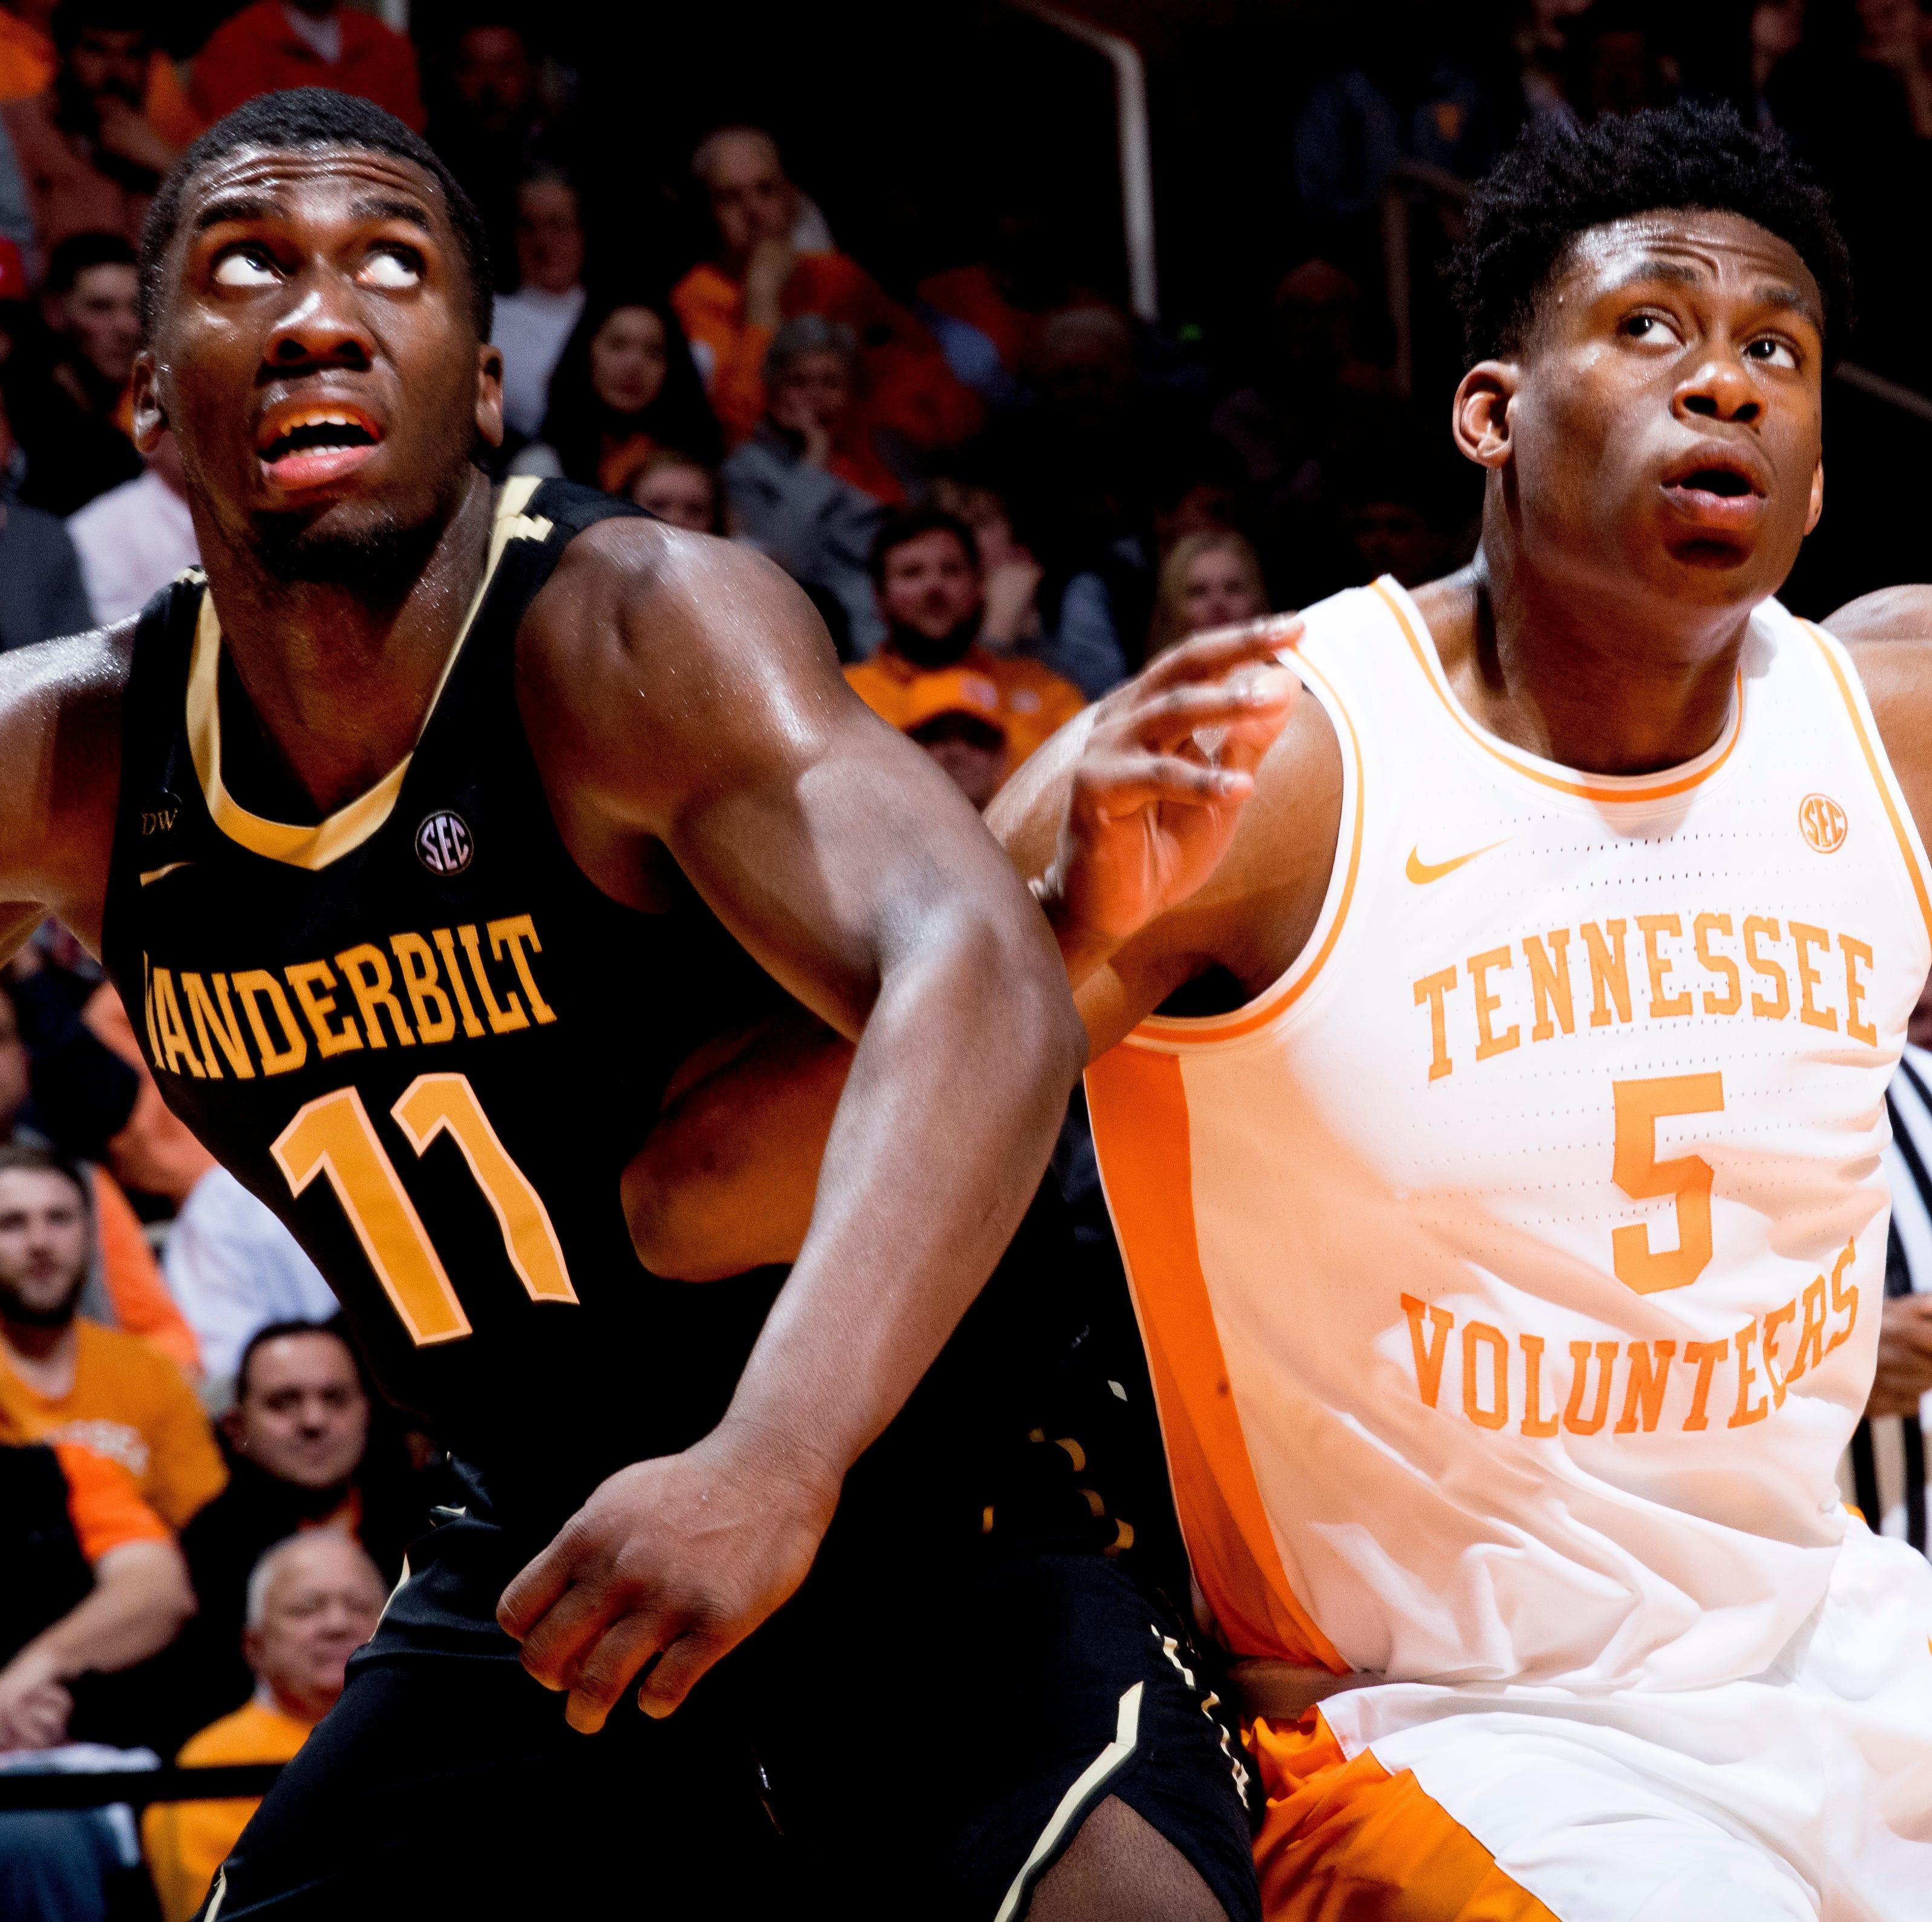 Simi Shittu's frustrating night vs Tennessee basketball latest in Vanderbilt's fading season